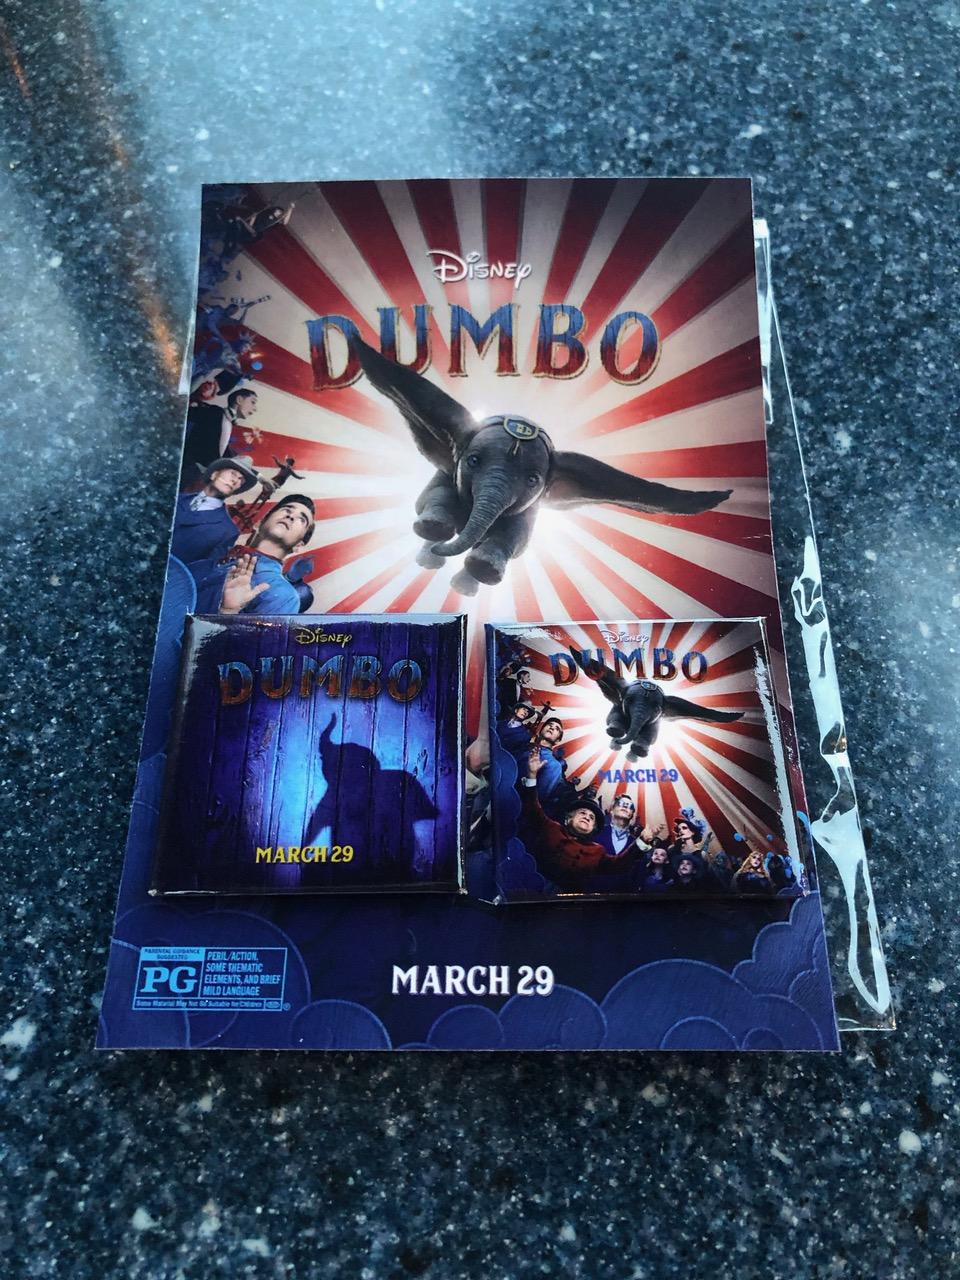 209bb3739893c Disneyland Celebrates Dumbo with Preview and Merchandise